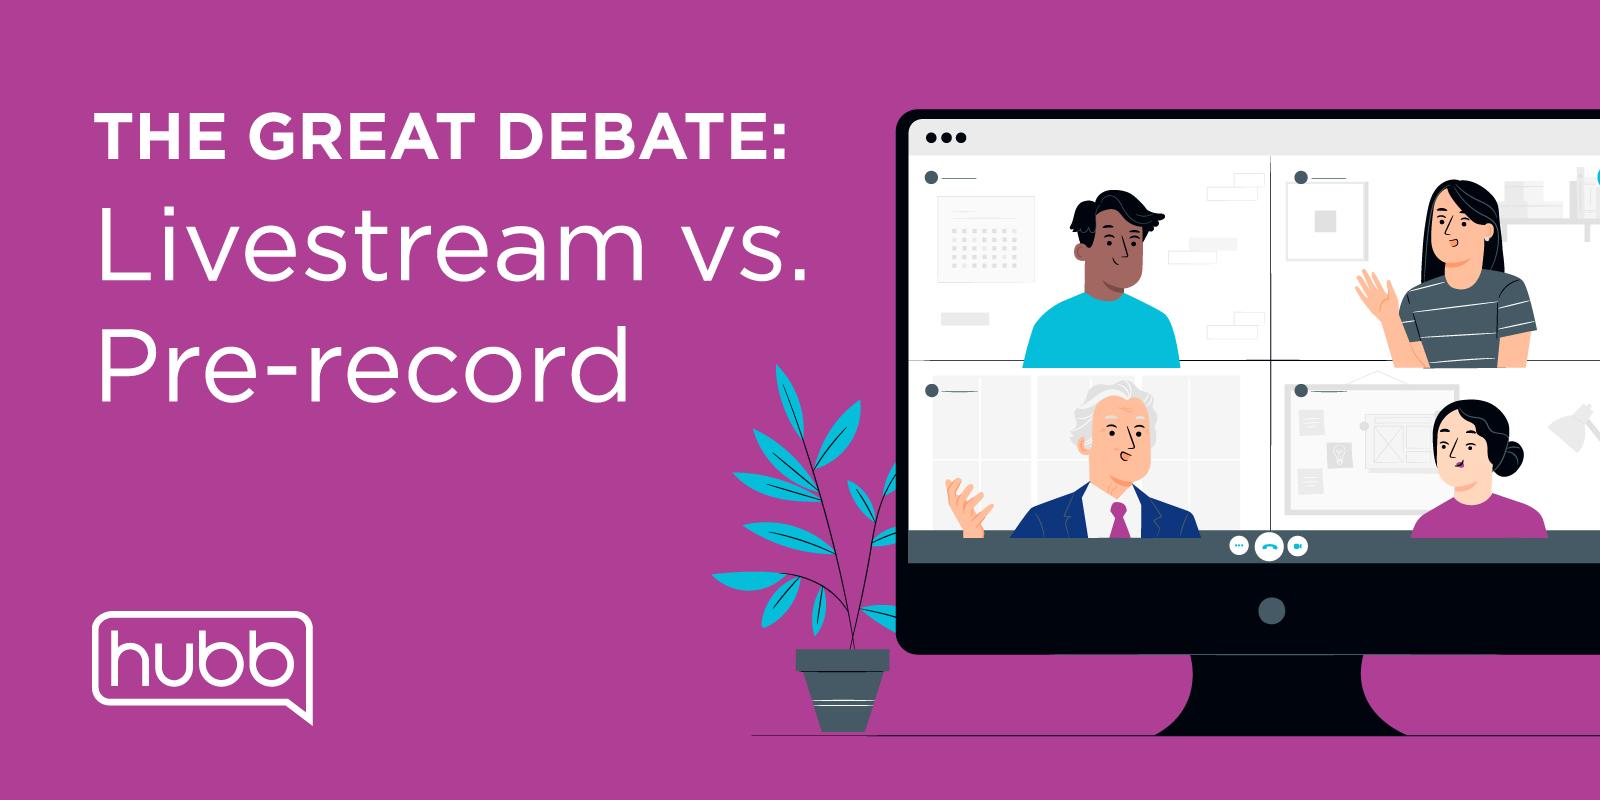 The Great Debate: Livestream vs. Pre-Recorded